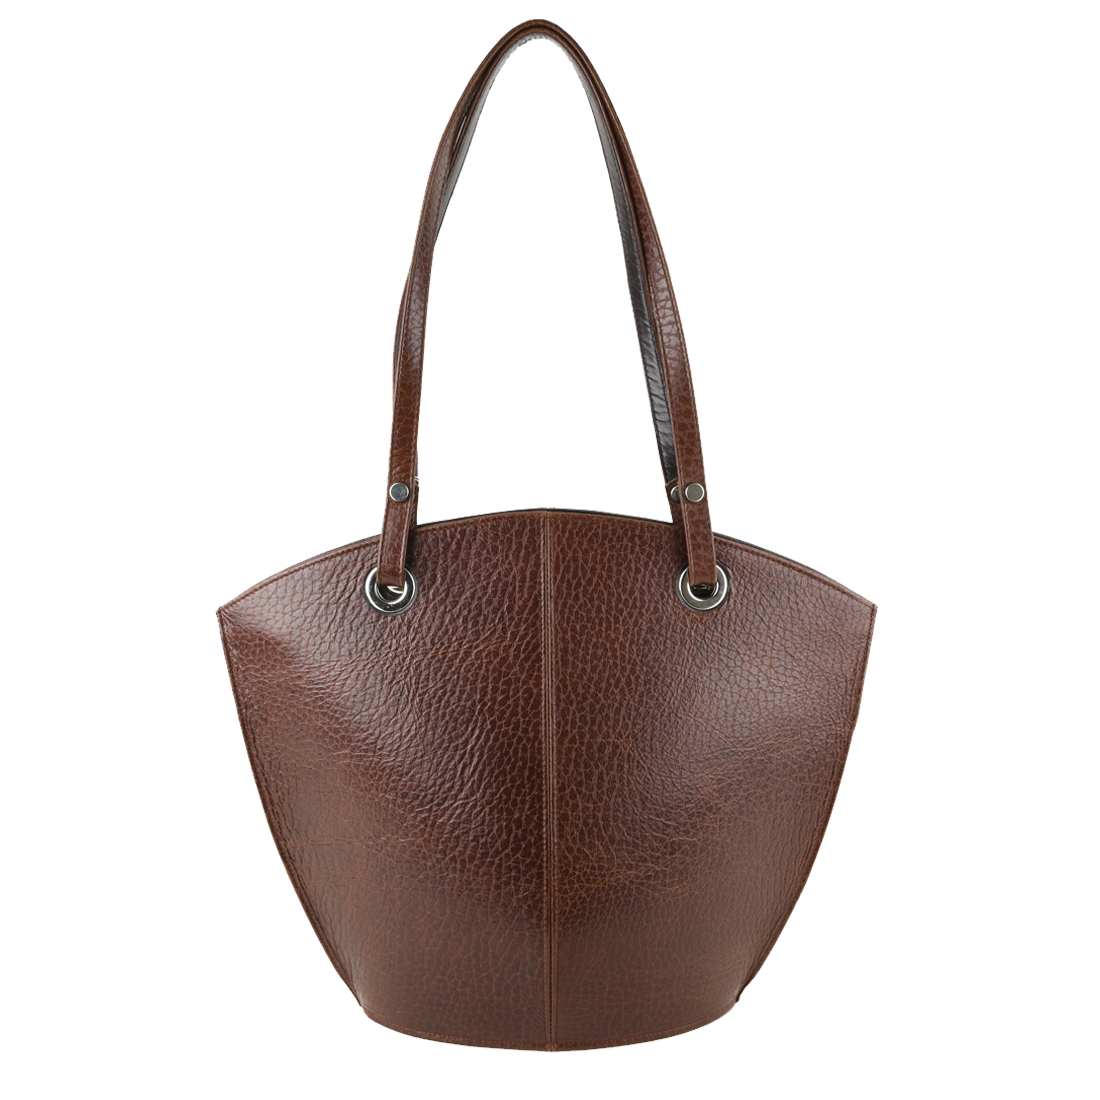 Audrey Dark Brown Leather Tote Bag